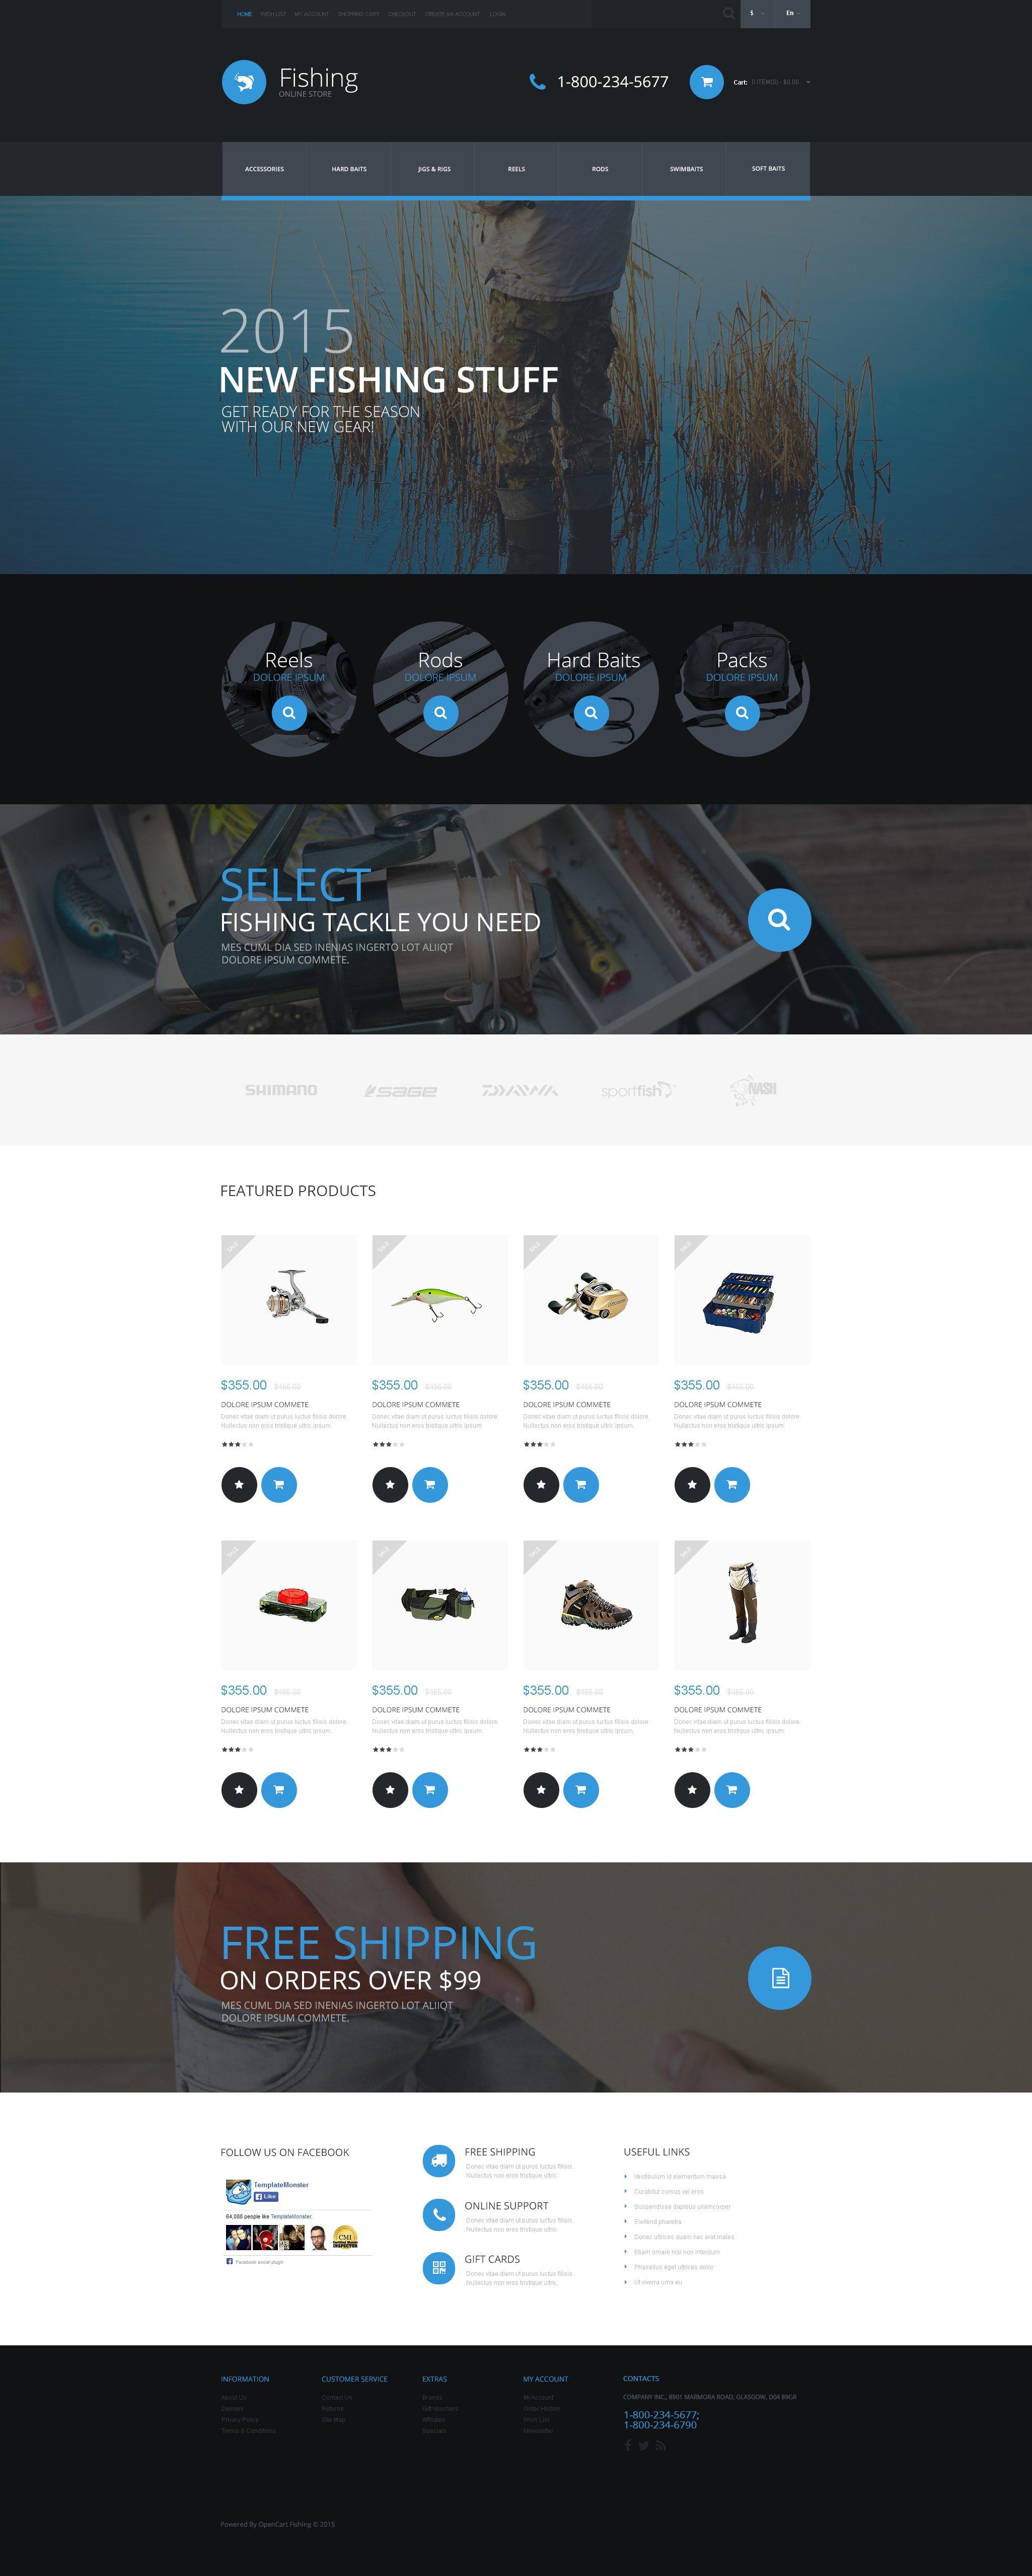 Fishing Equipment Store Template OpenCart №53849 - captura de tela